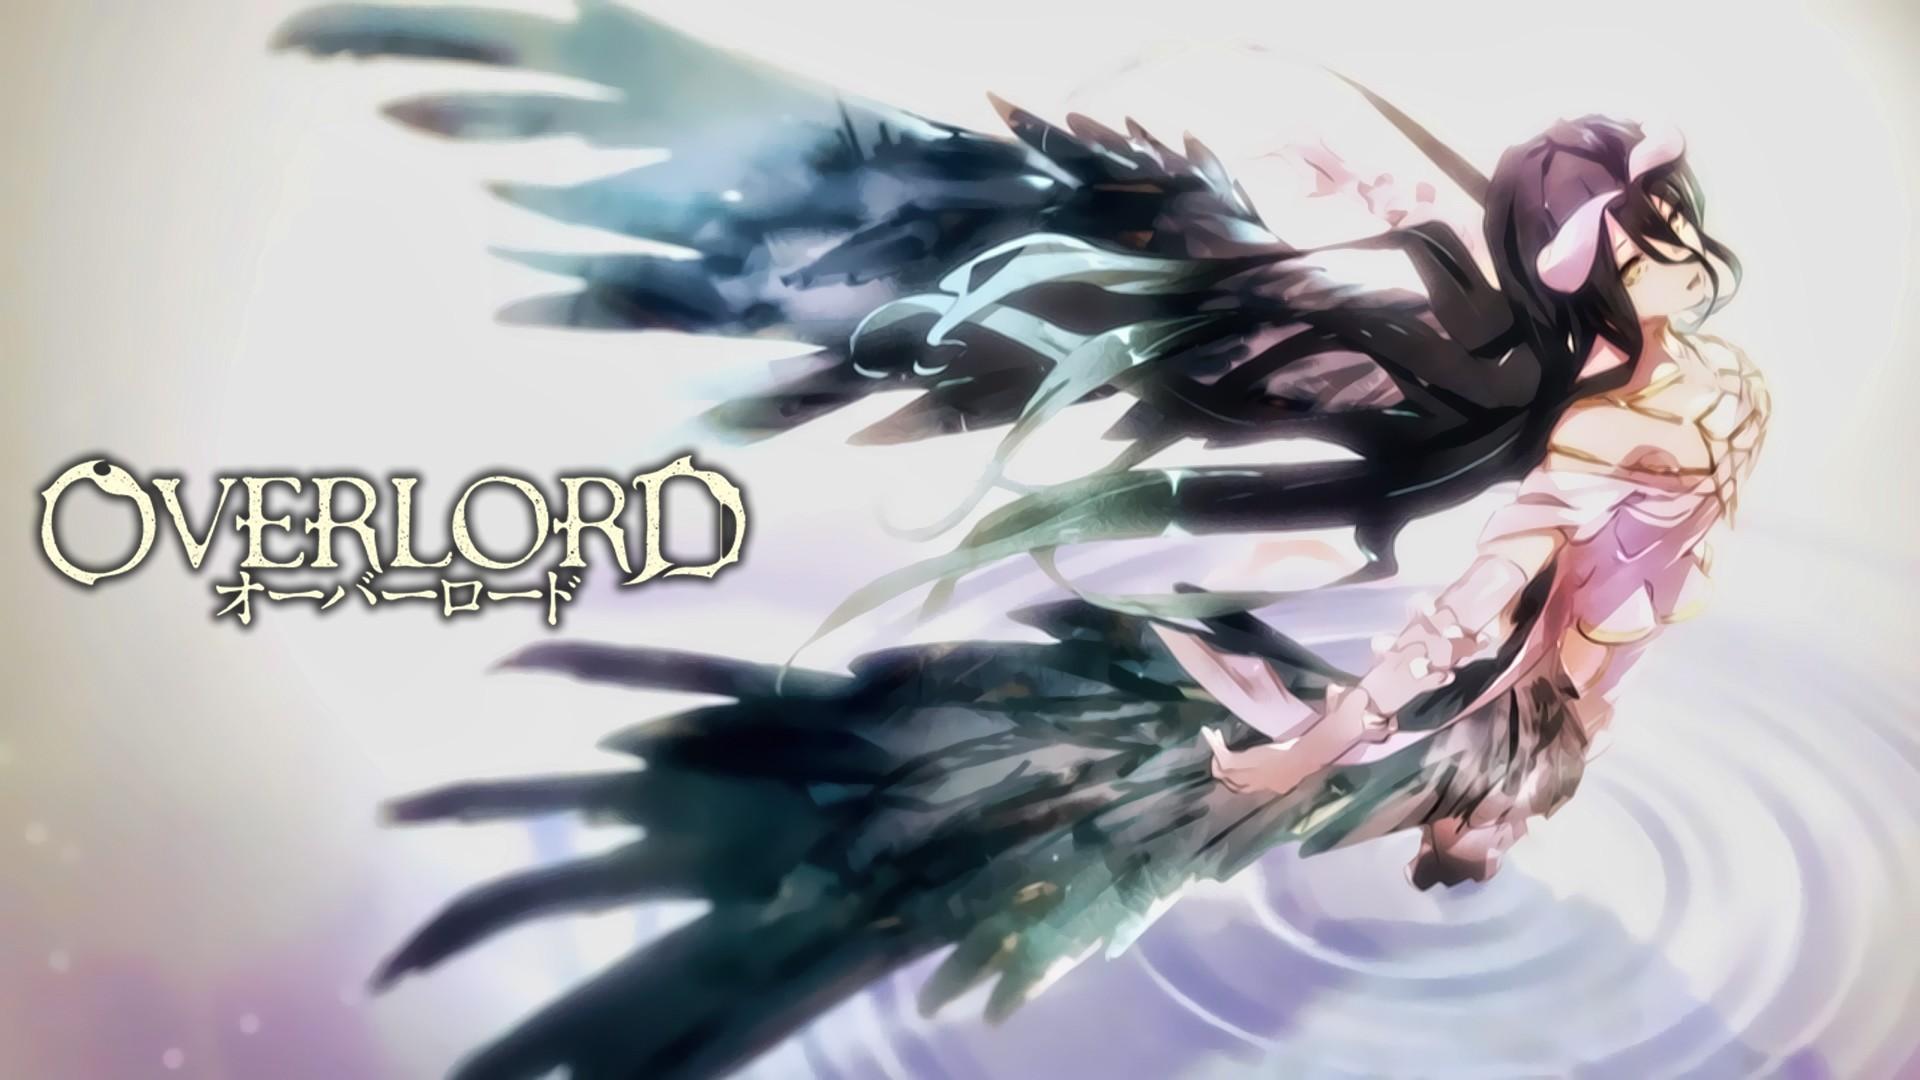 Anime 1920x1080 Overlord (anime) Albedo (OverLord) anime girls horns